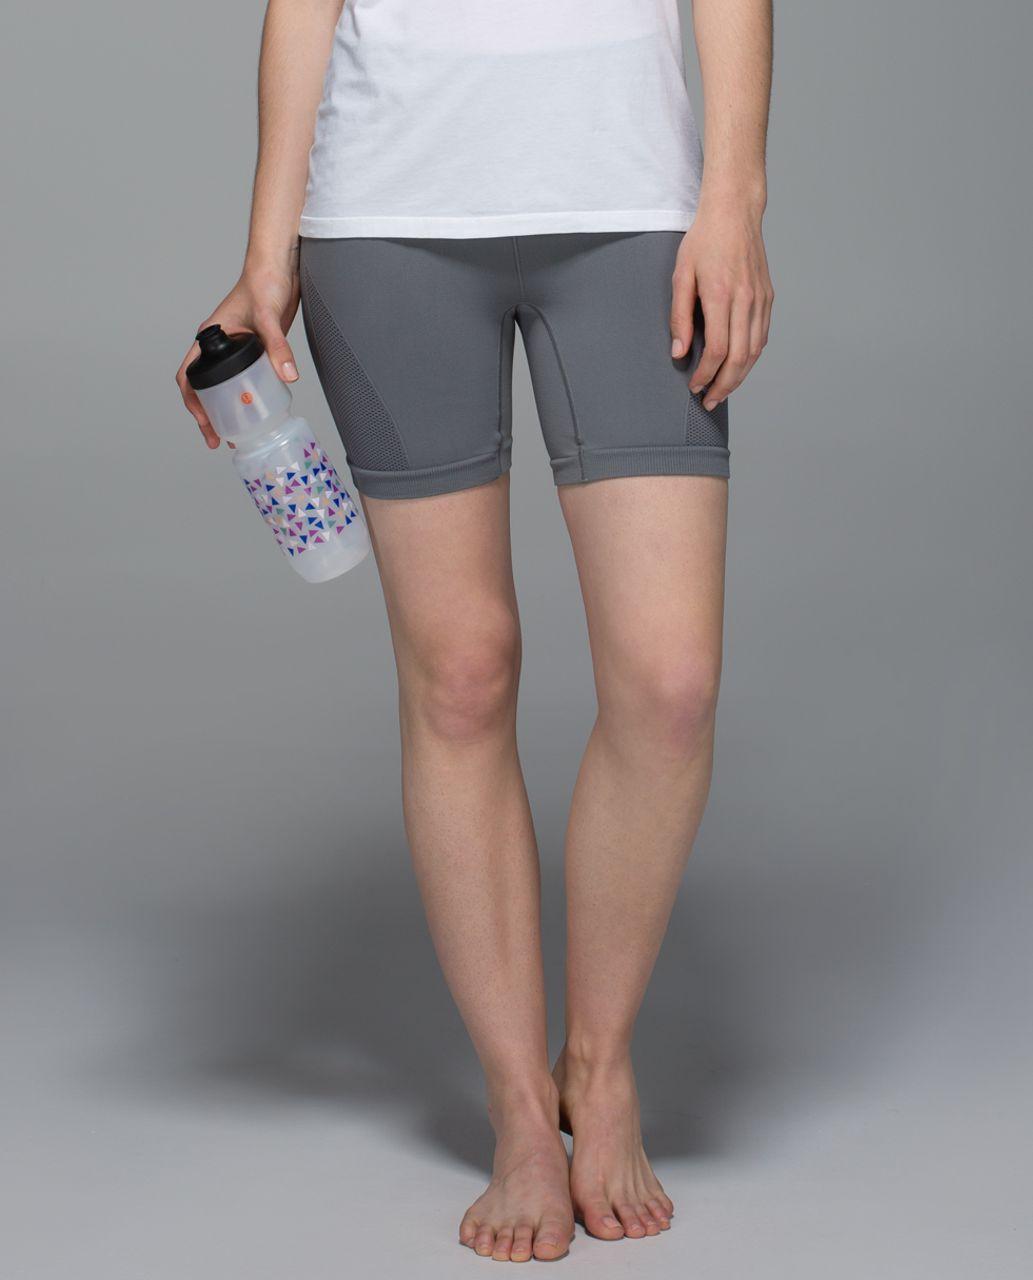 Lululemon Purist Cycling Water Bottle - Tri Pop Confetti Regal Plum Electric Coral